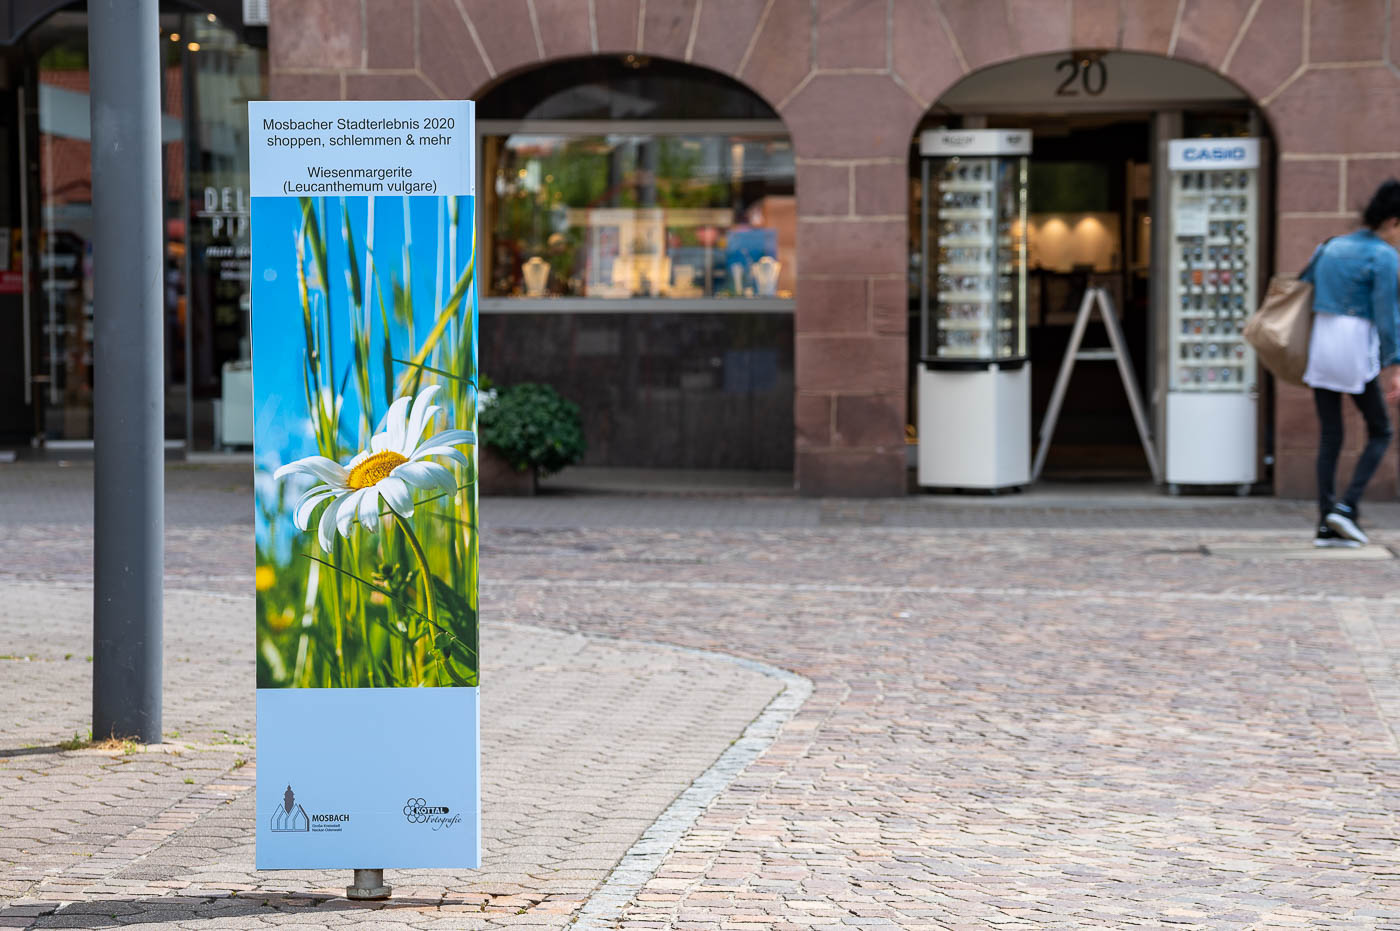 Mosbacher Stadterlebnis 2020